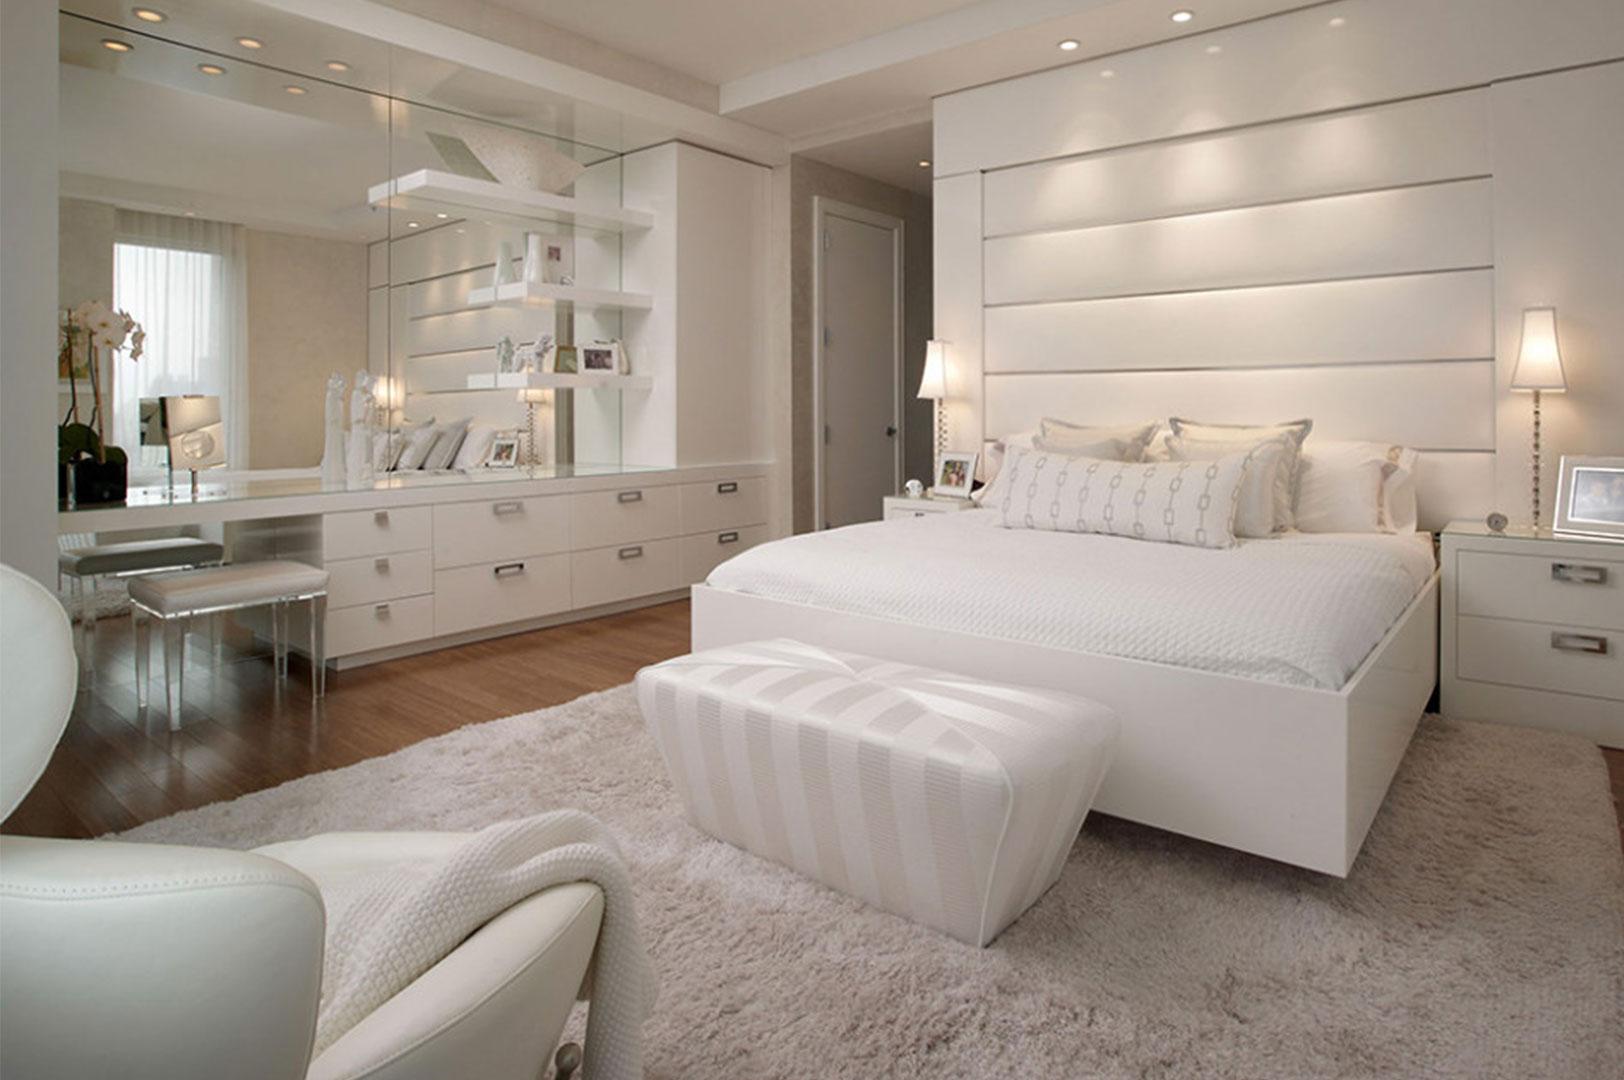 White Bedroom: 16 Modern Design Ideas For Your Bedroom